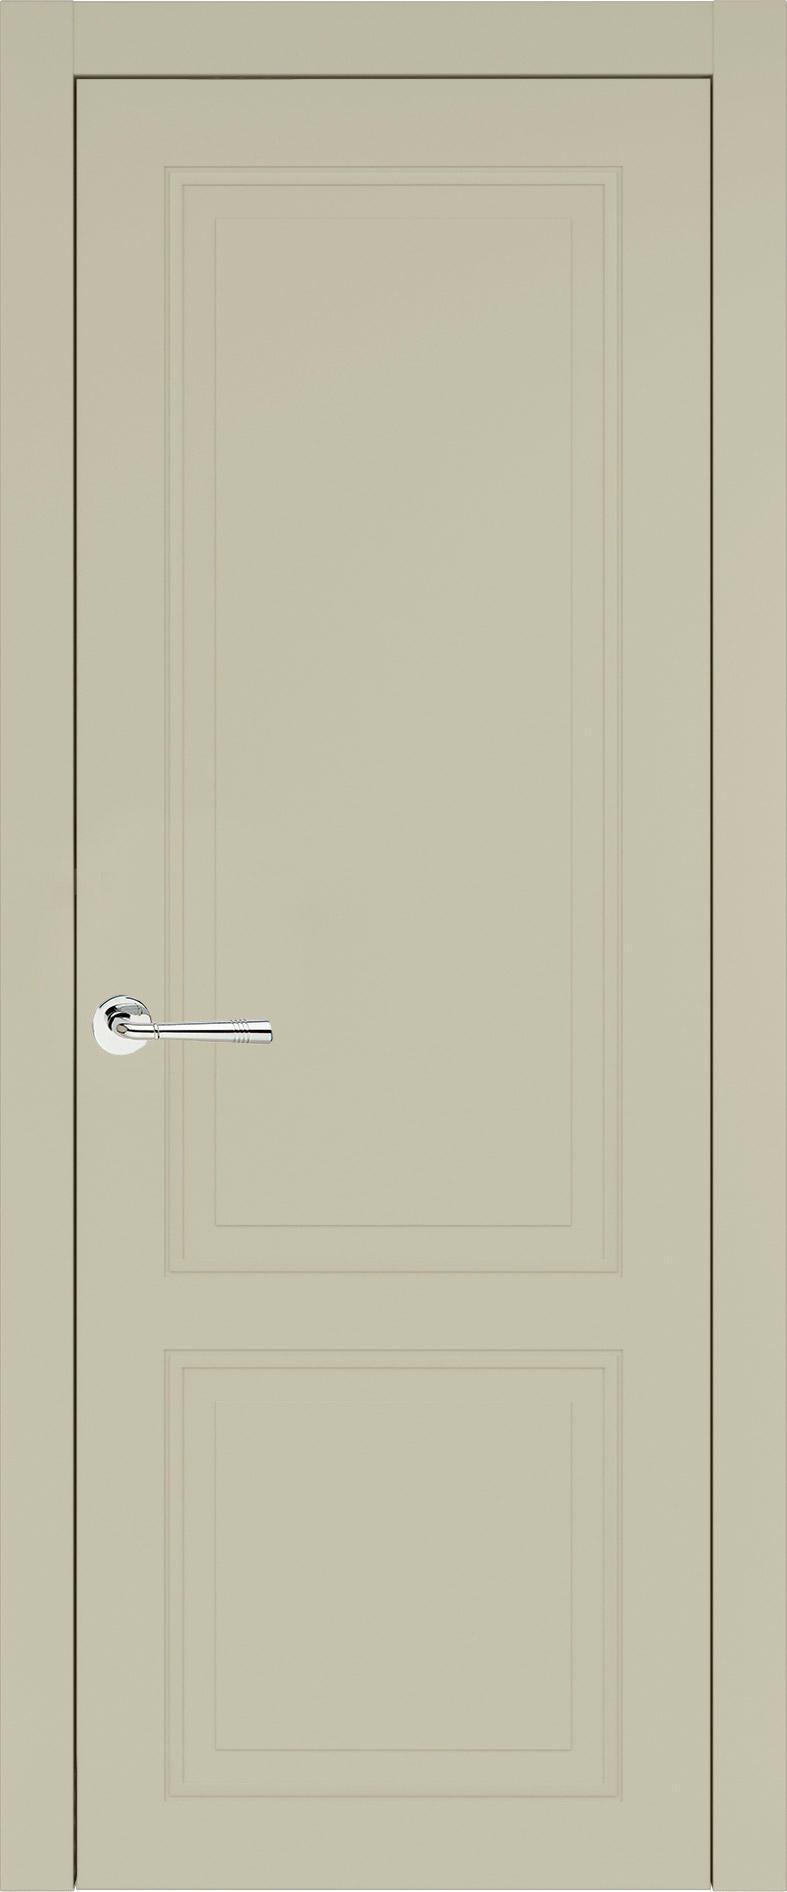 Dinastia Neo Classic цвет - Серо-оливковая эмаль (RAL 7032) Без стекла (ДГ)